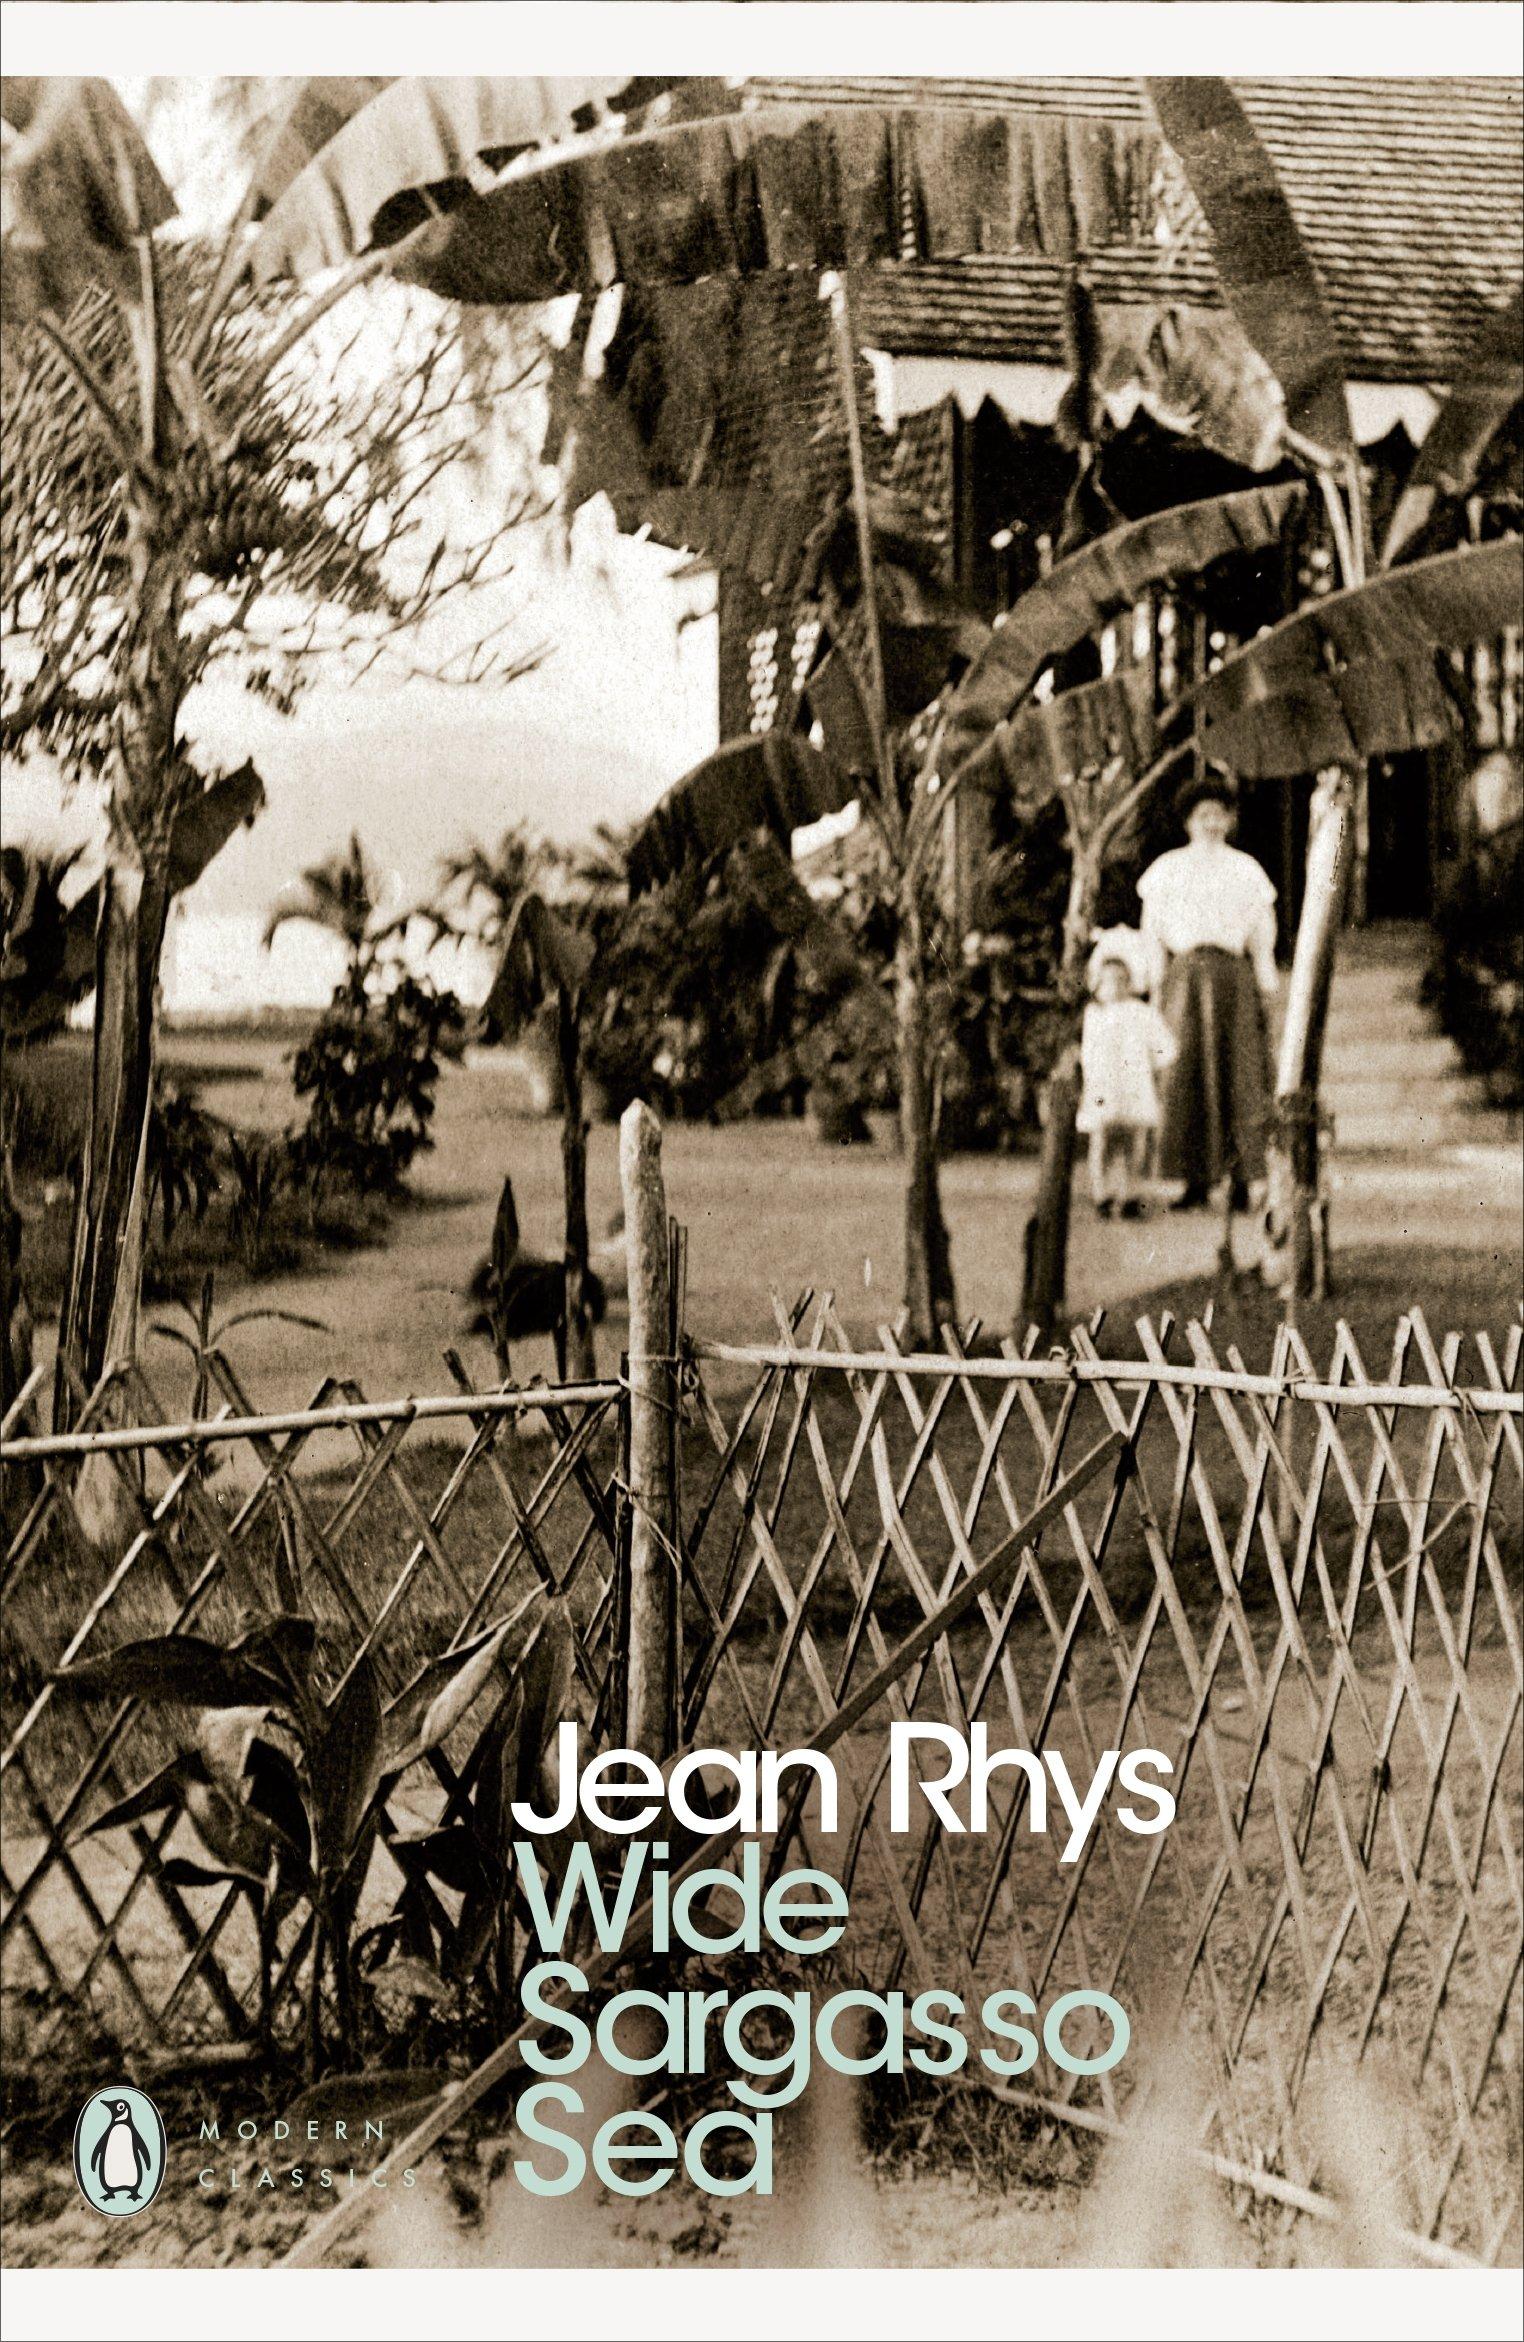 Wide Sargasso Sea (Penguin Modern Classics): Amazon.co.uk: Rhys, Jean:  9780141182858: Books